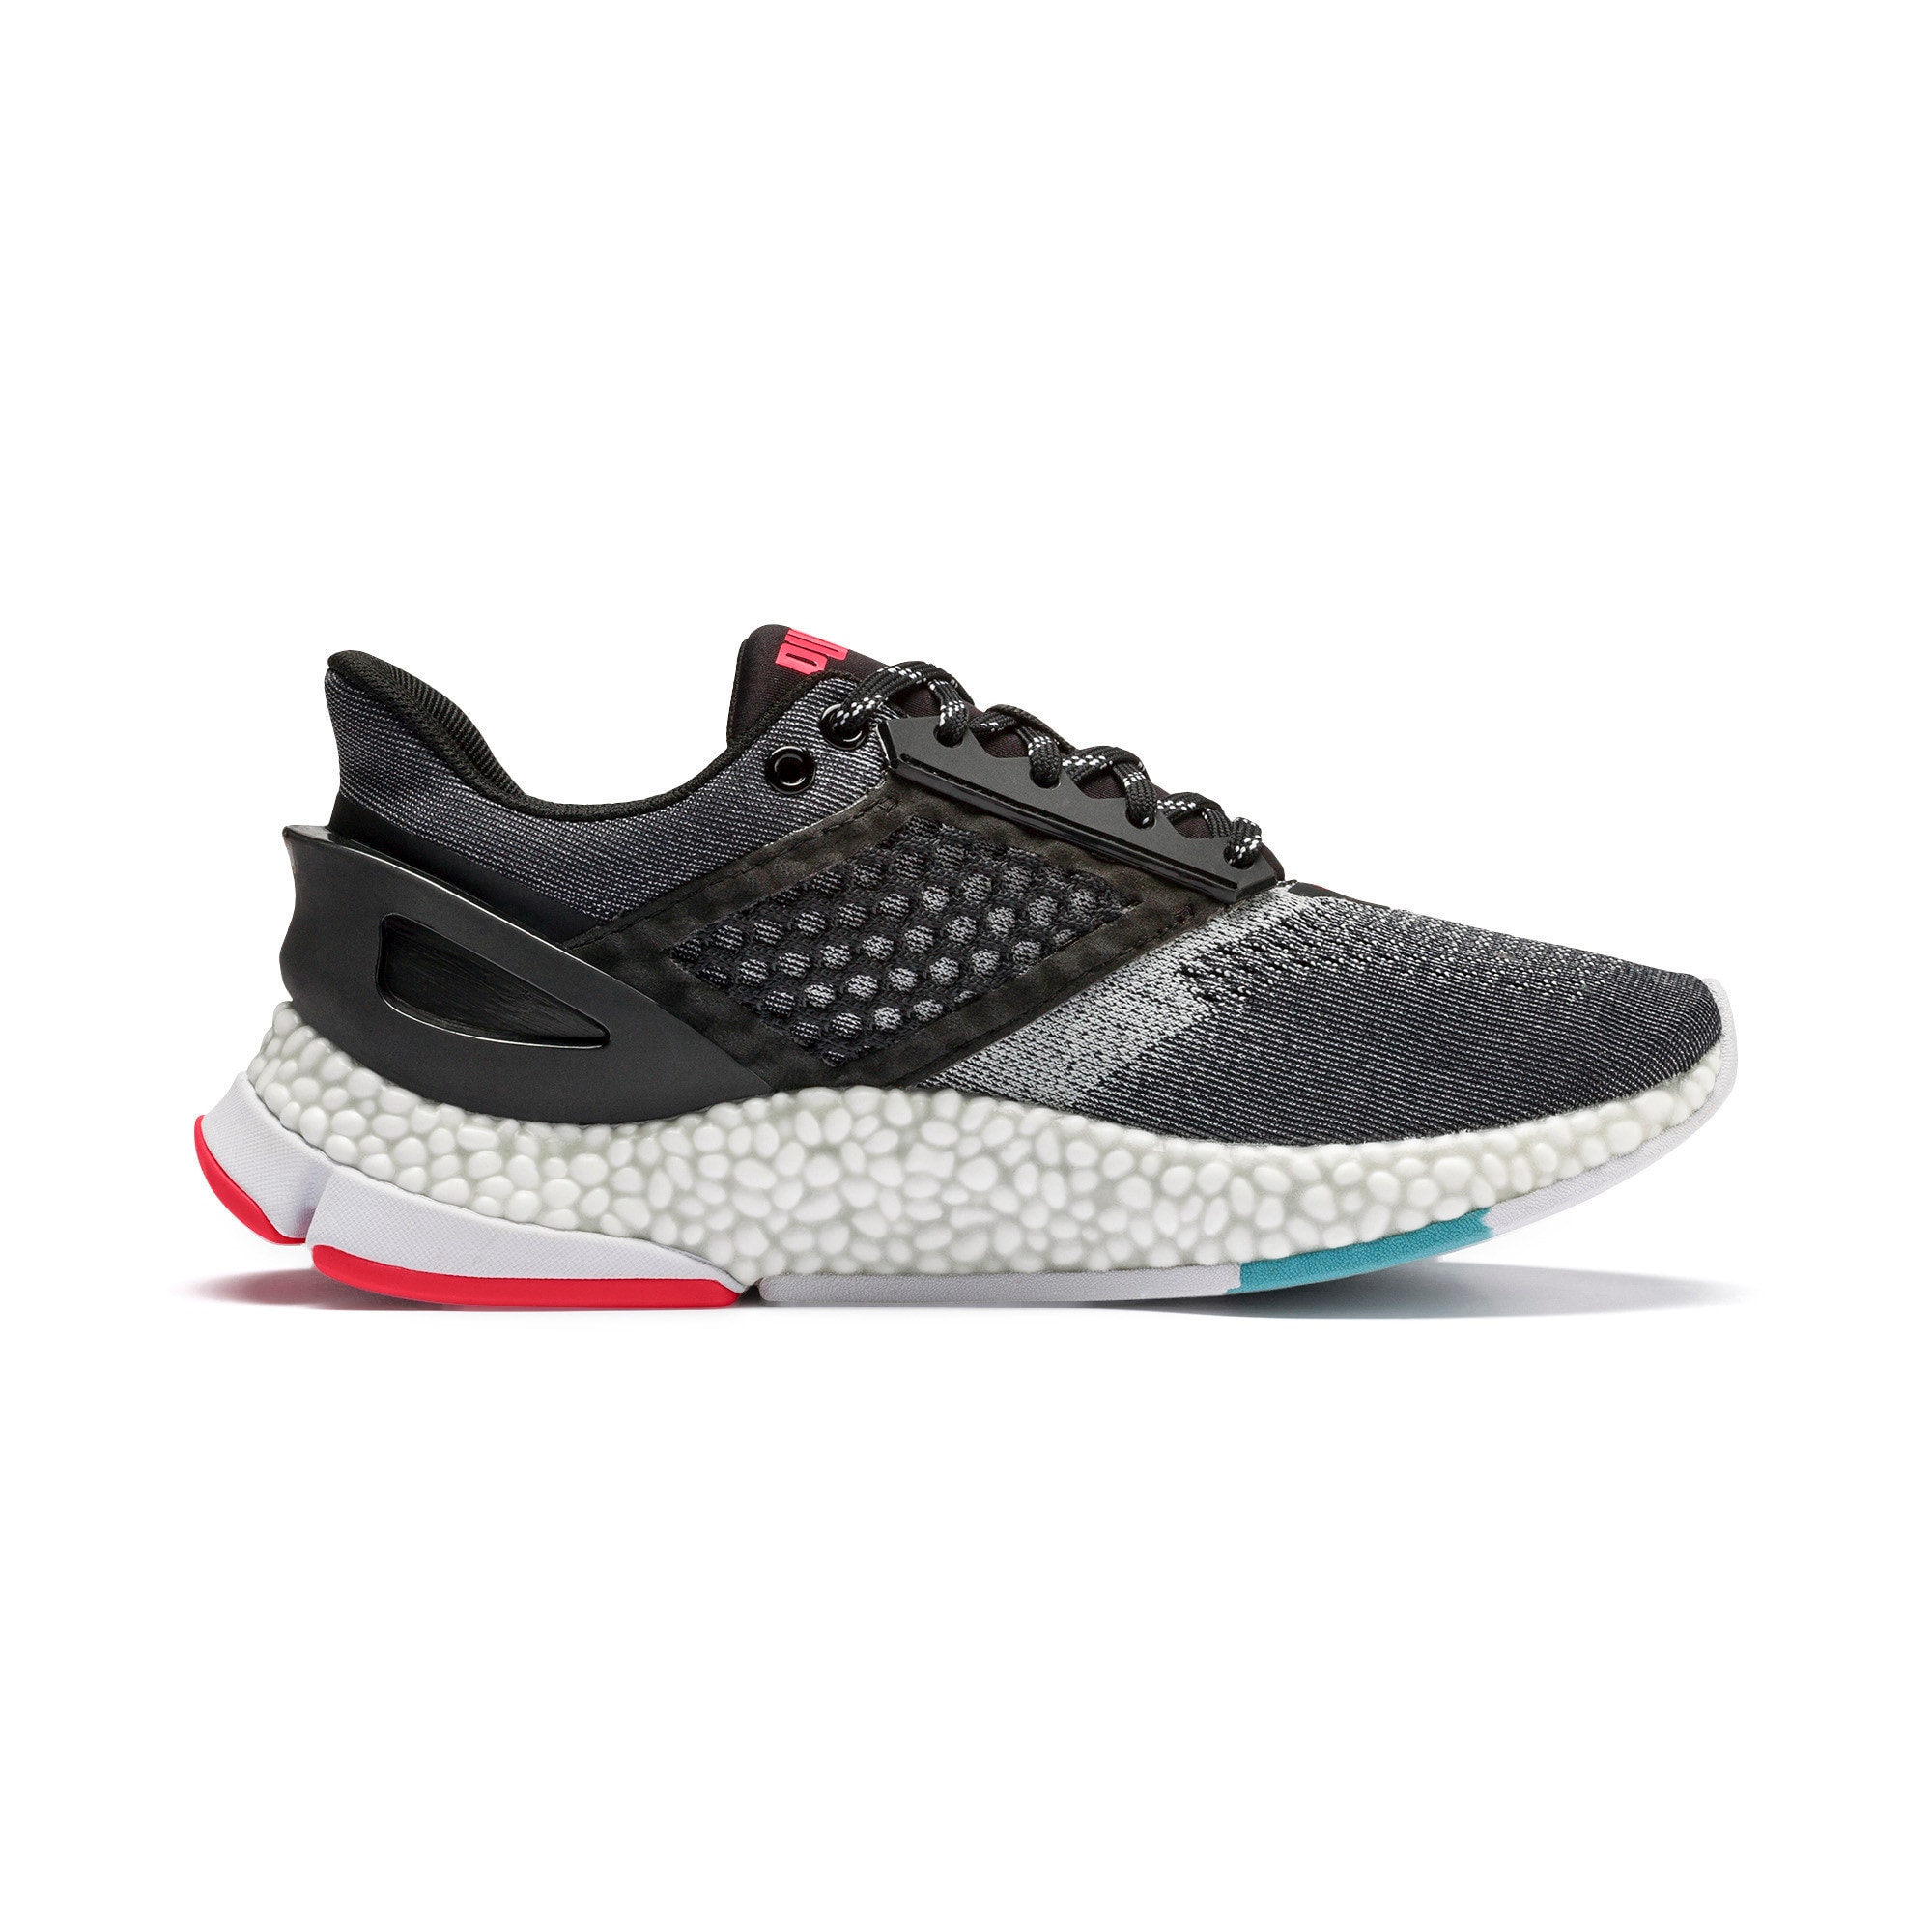 Thumbnail 9 of HYBRID NETFIT Astro Women's Running Shoes, Puma Black-Pink Alert, medium-IND